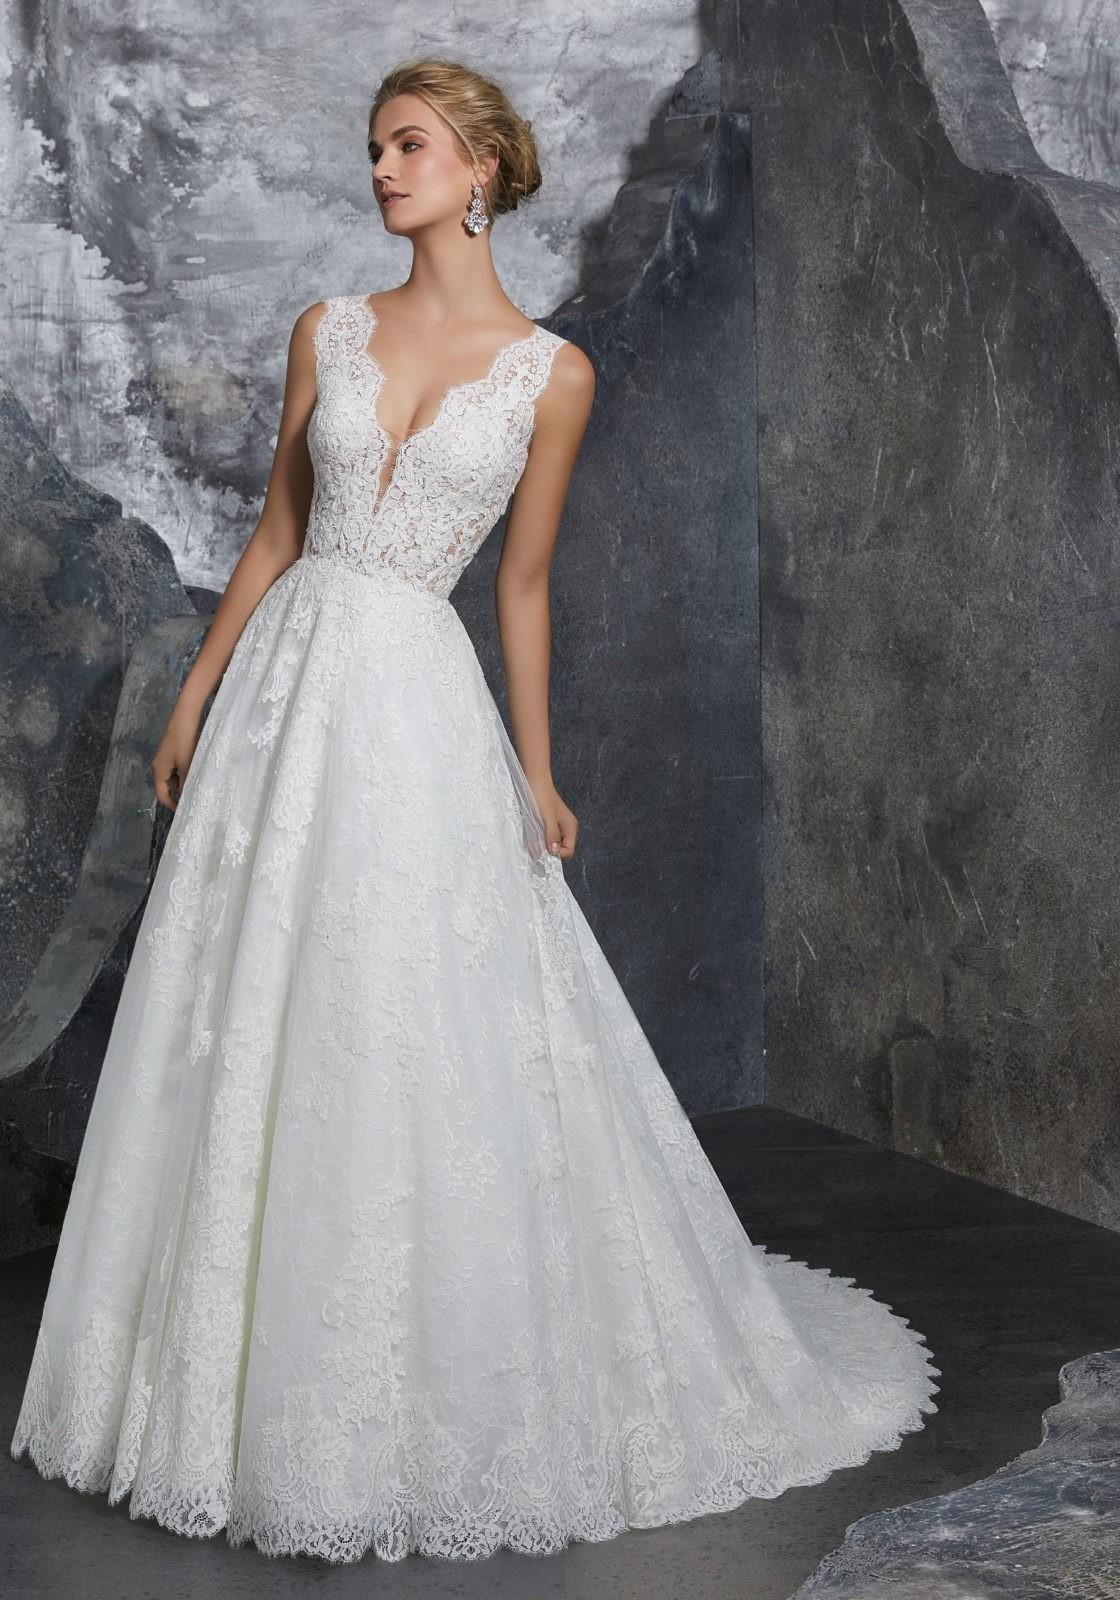 quarter sleeve wedding dresses photo - 1